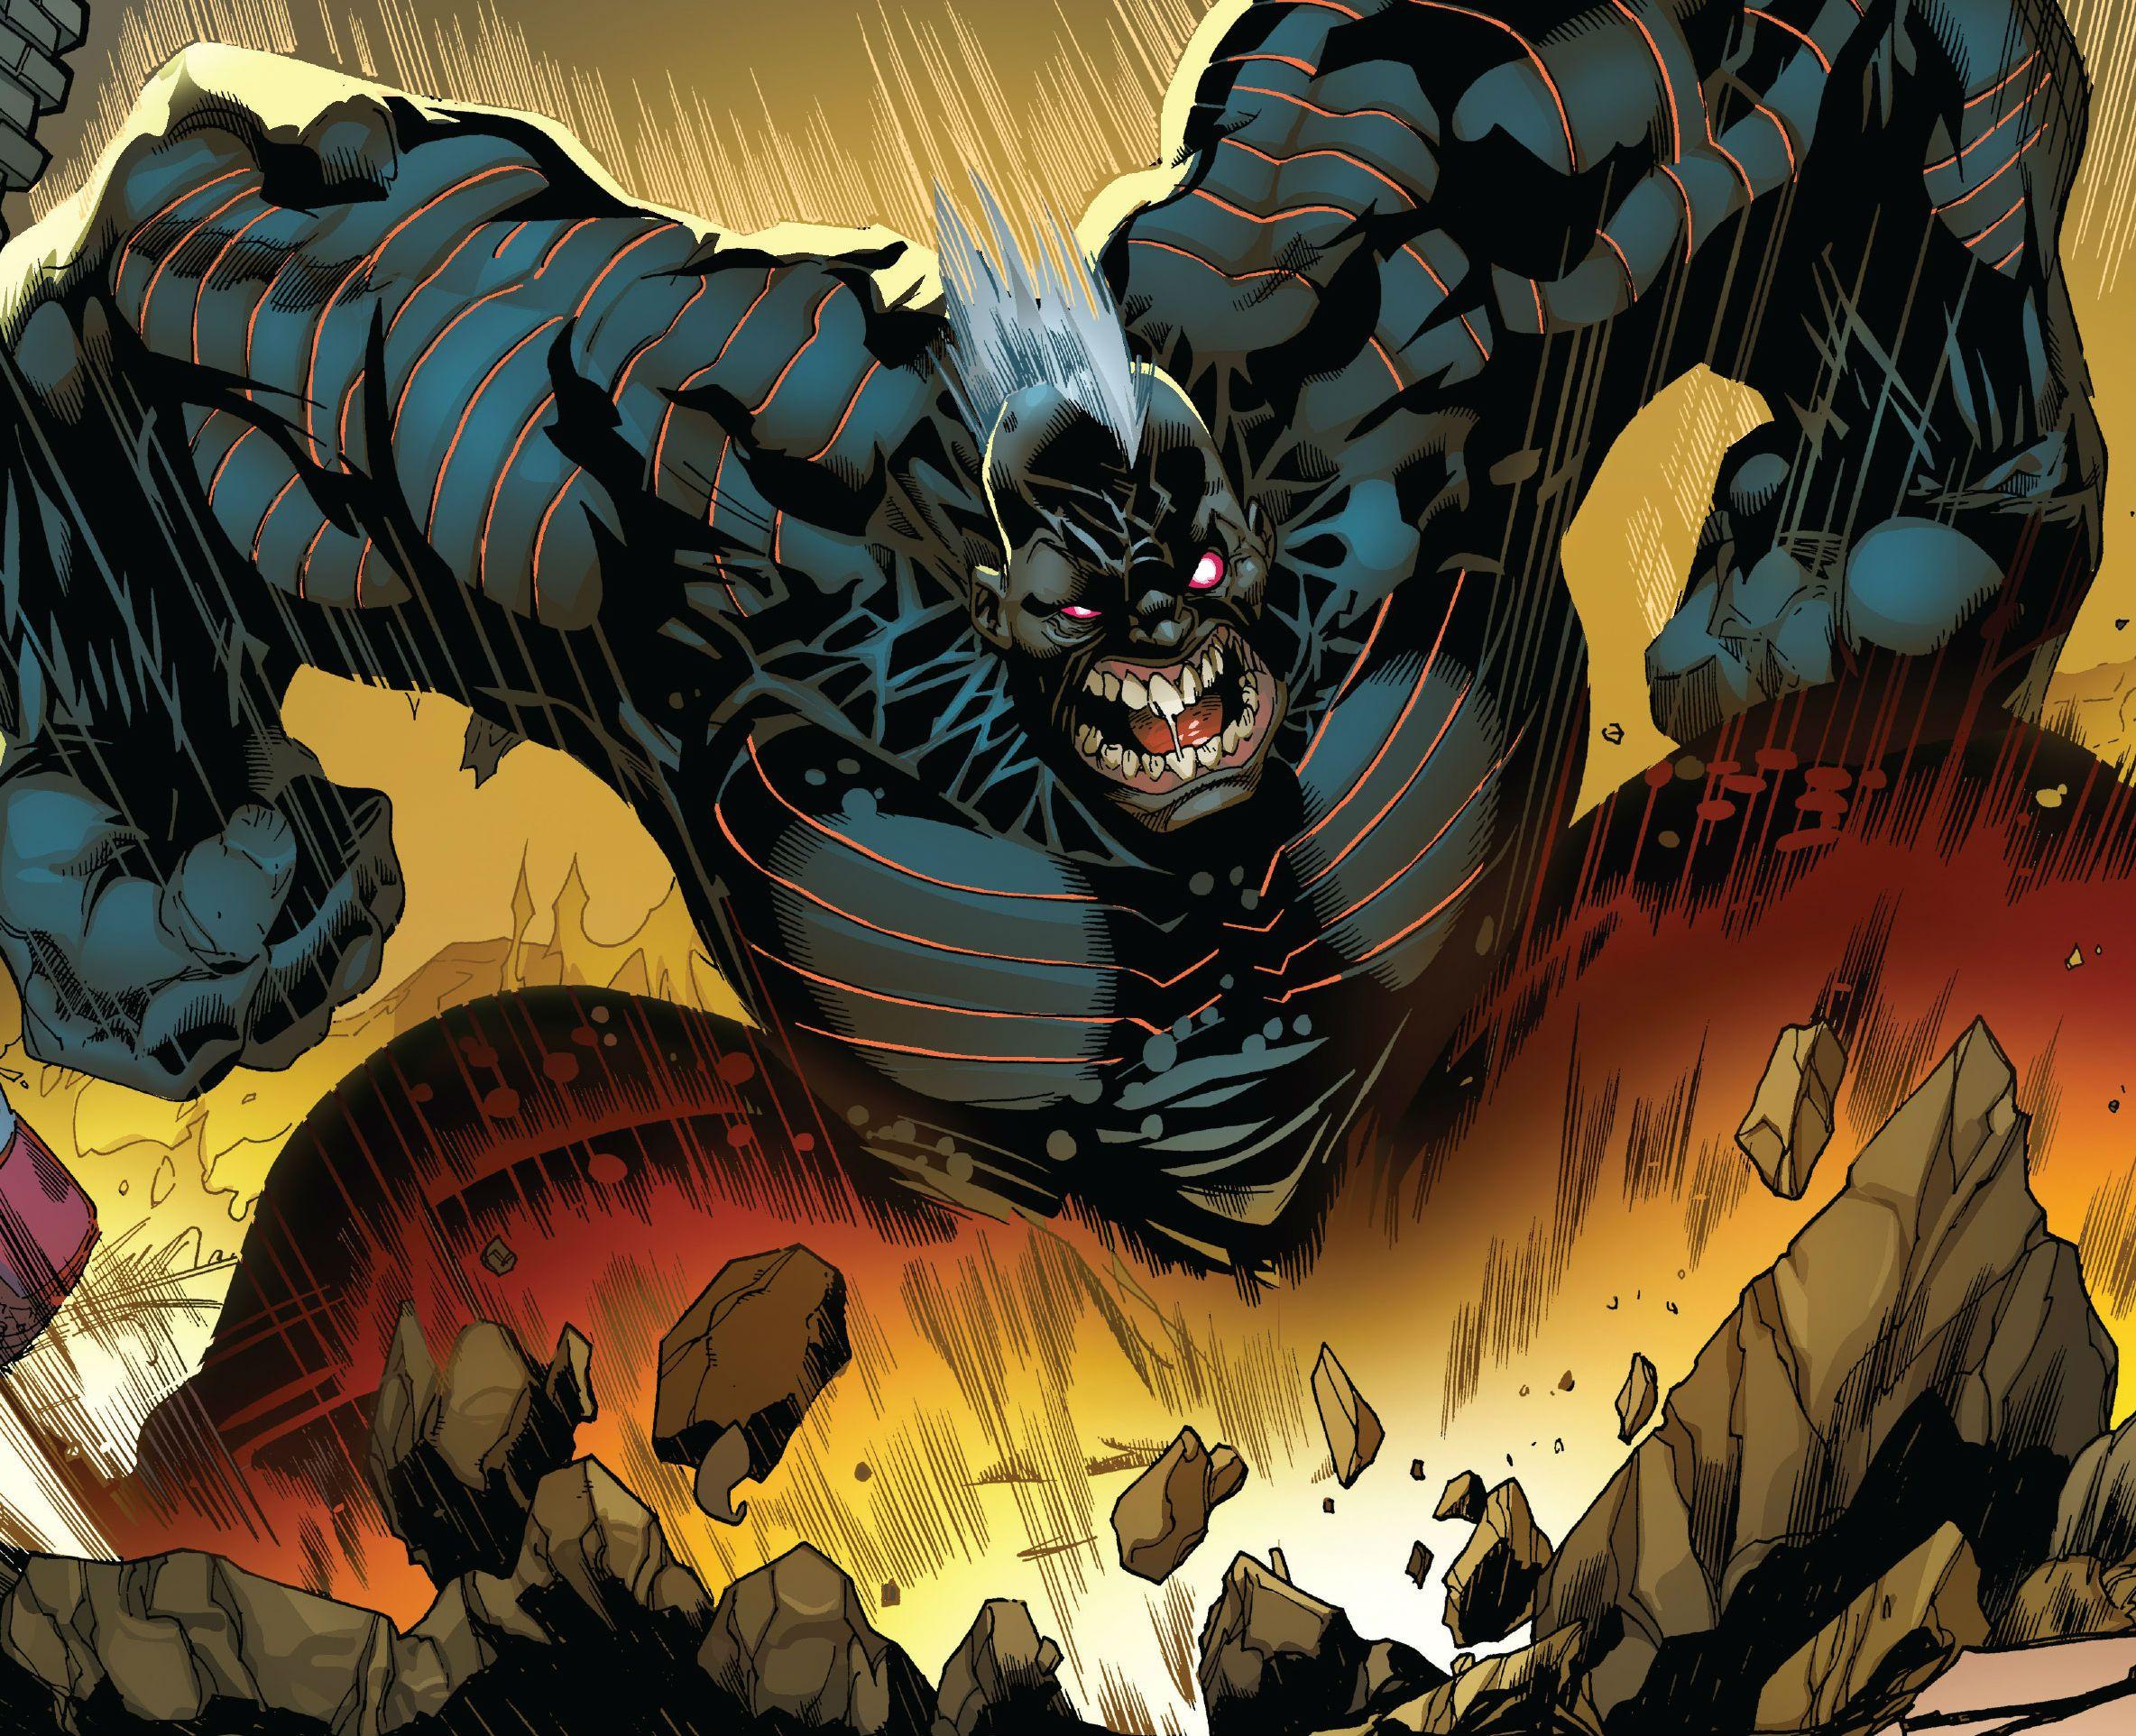 Kluh (Bruce Banner) Clone of Hulk : preview from Nova #24 ... by David  Baldeon | Marvel comics superheroes, Hulk marvel, Superhero comic